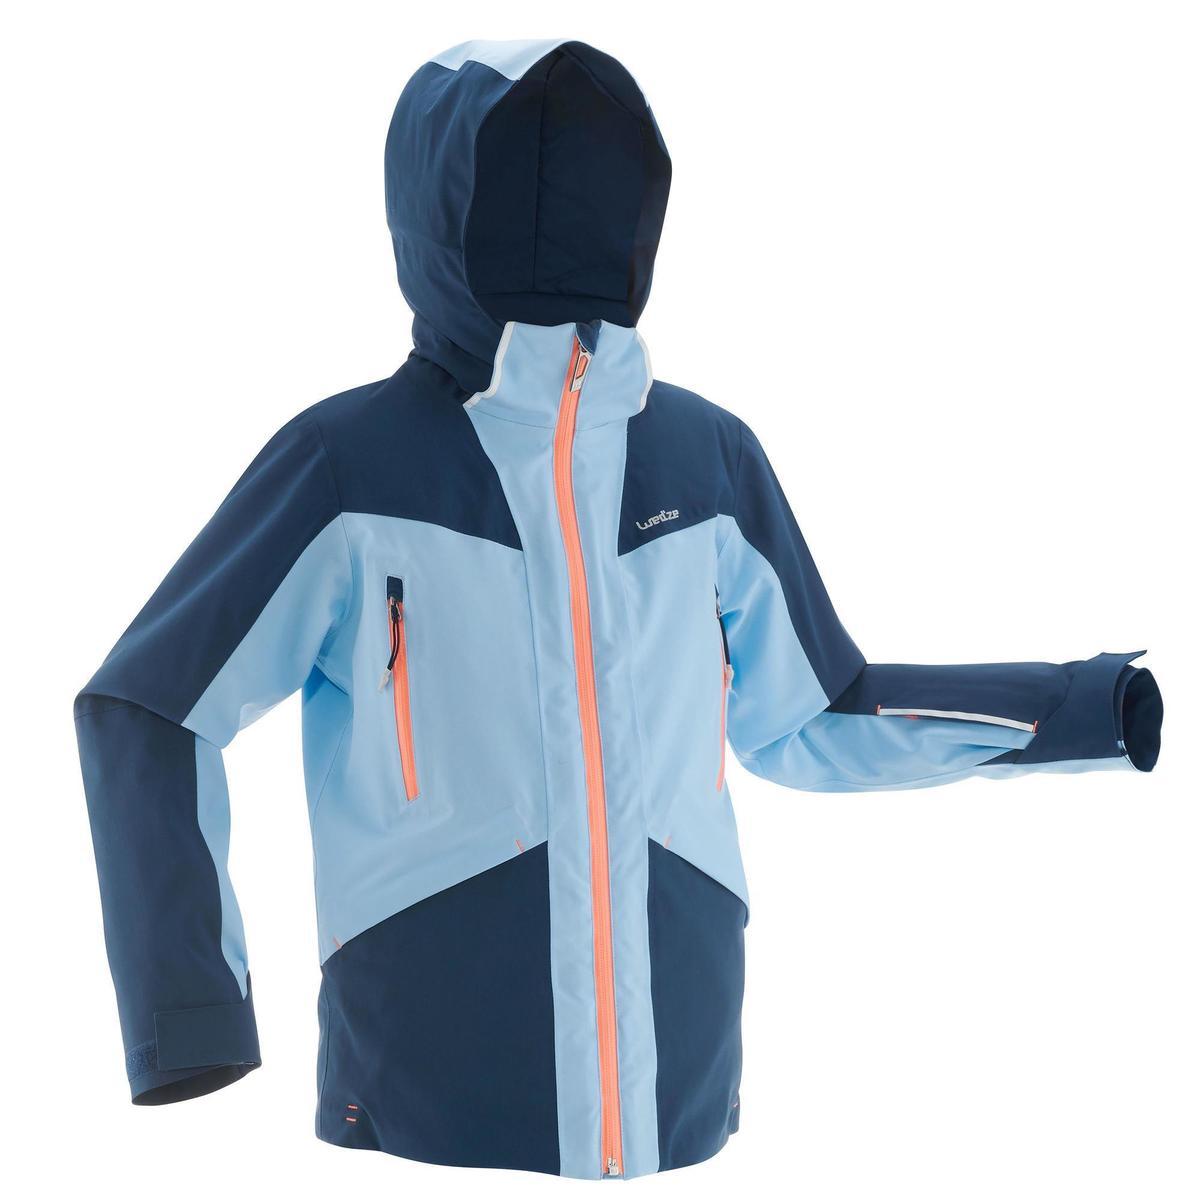 Bild 1 von Skijacke Piste 900 Kinder blau